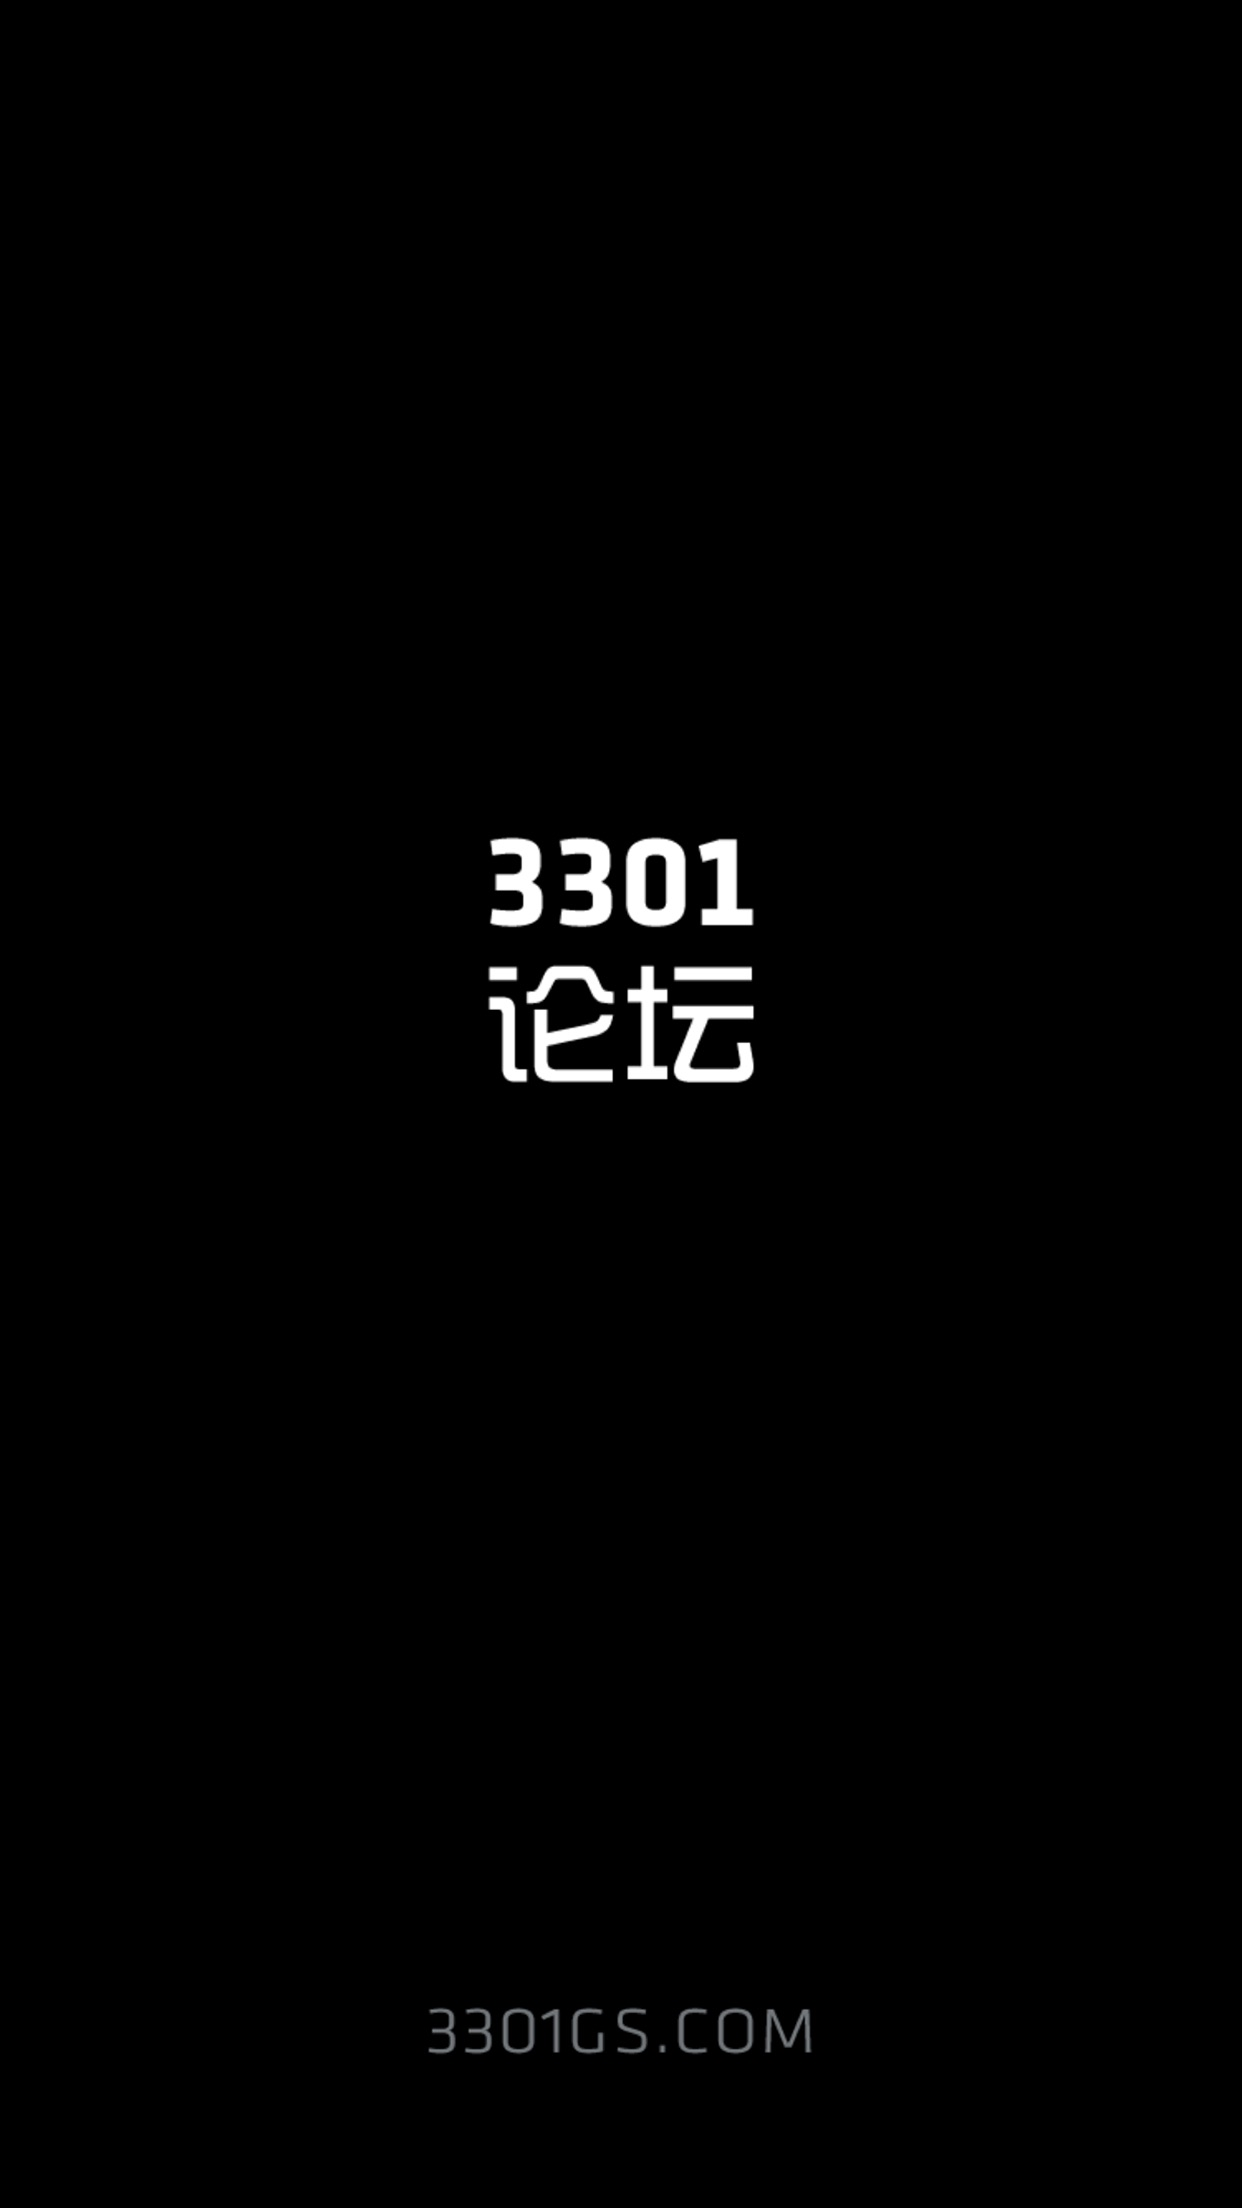 3301论坛 - 3301gs.com Screenshot